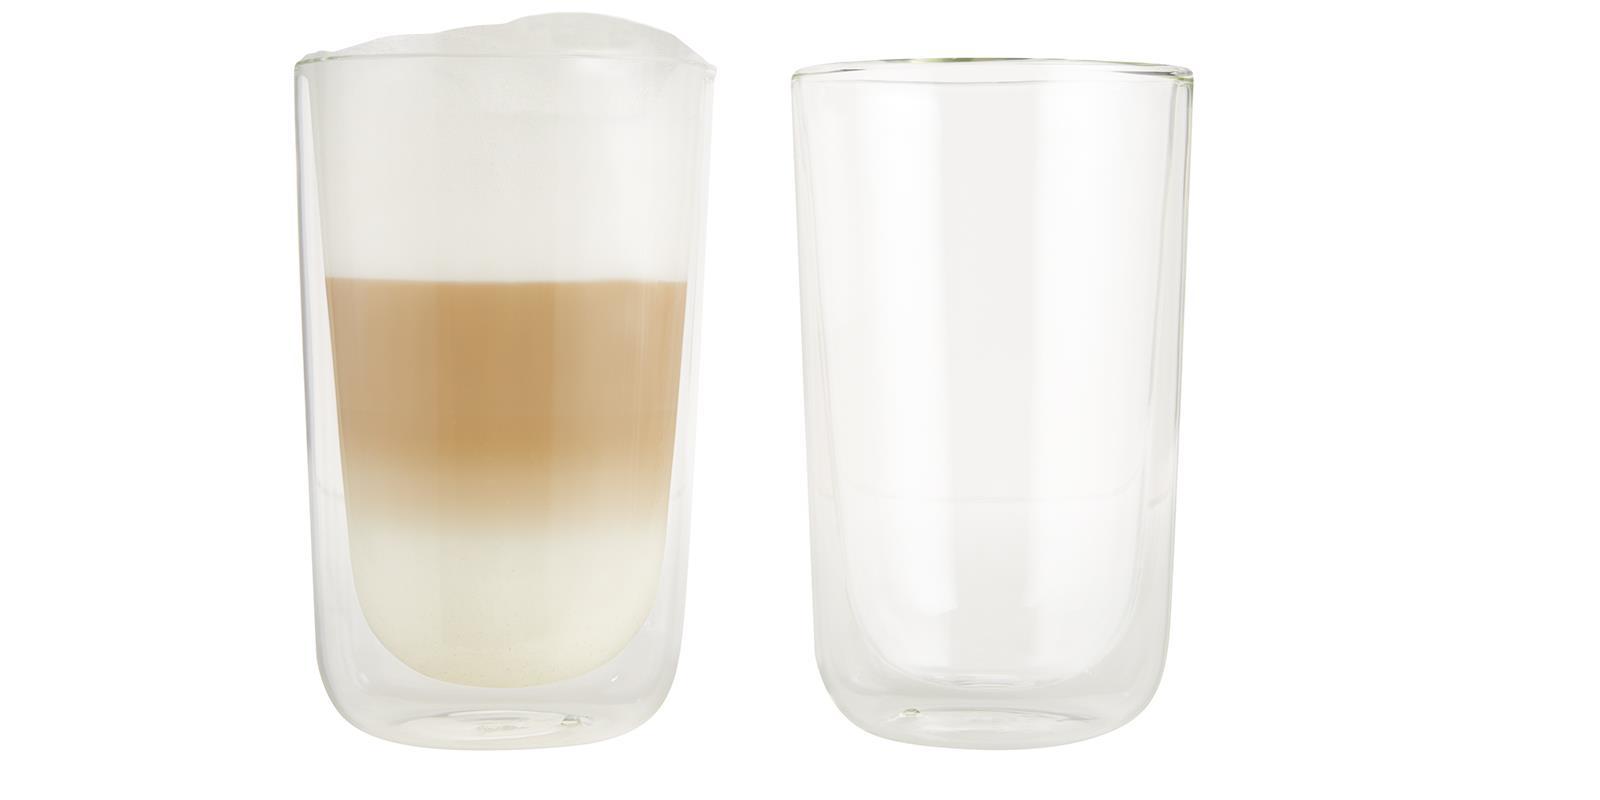 glas thermo latte macchiato 2er ernesto thermoglas doppelwandiges gl sser set ebay. Black Bedroom Furniture Sets. Home Design Ideas